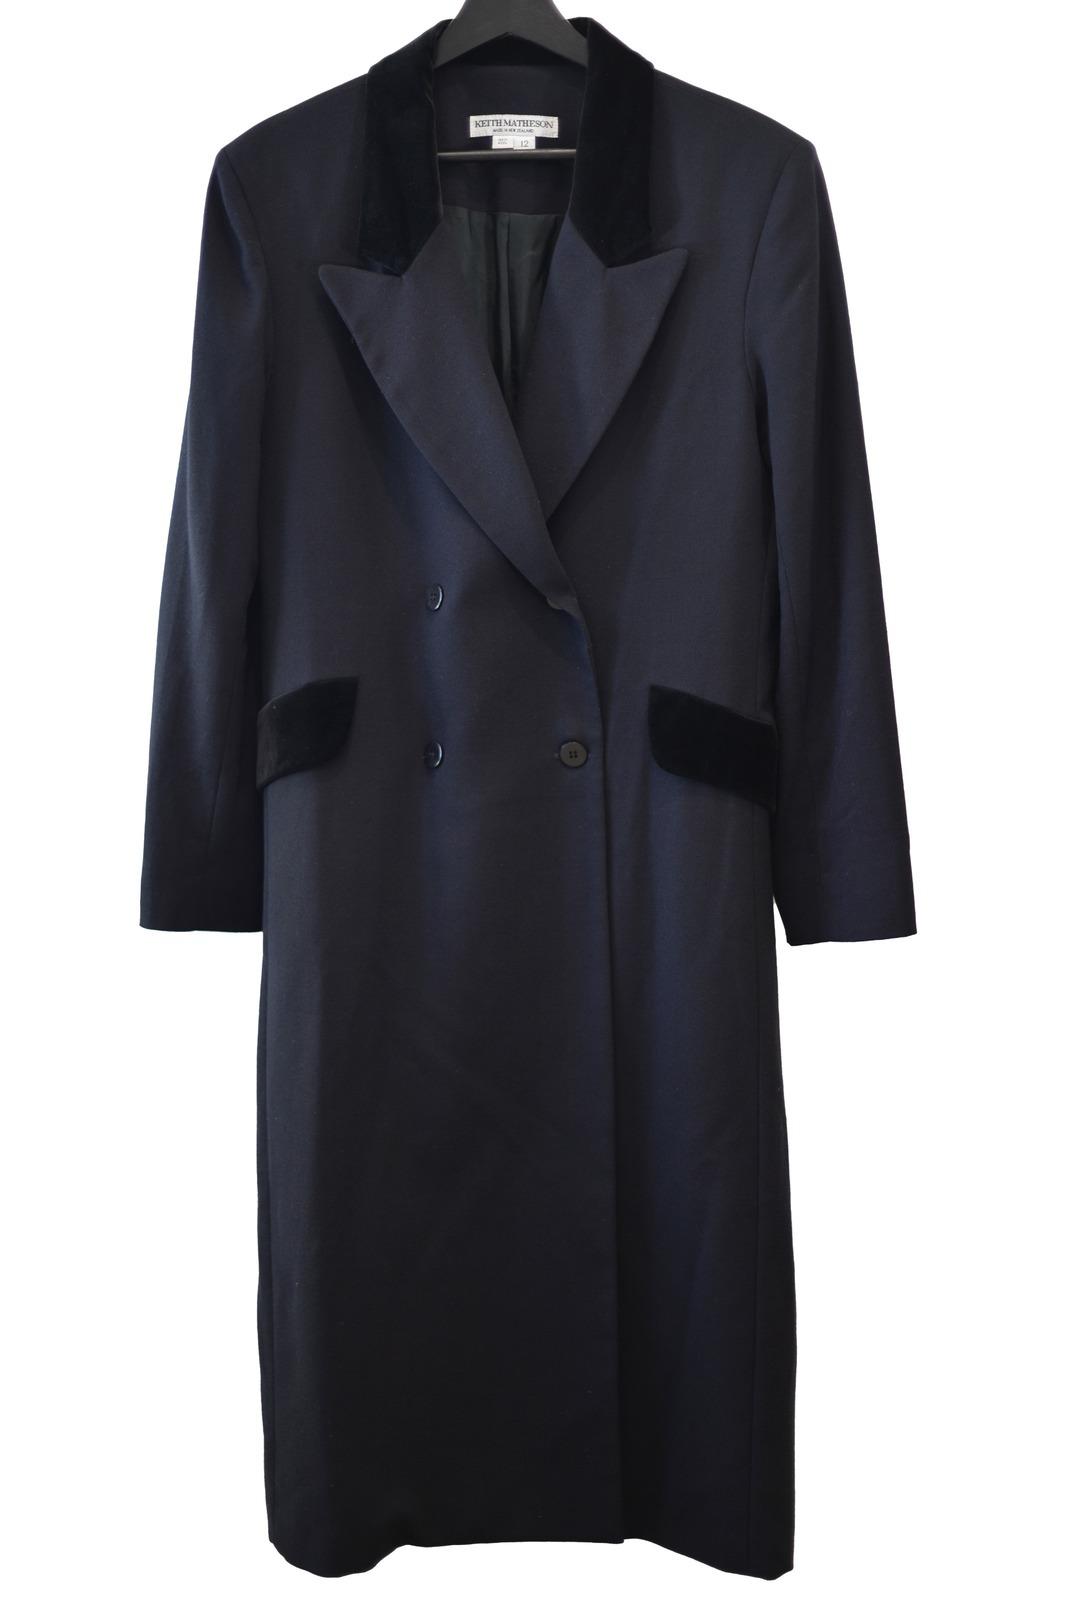 Rent: Wool crepe coat Size 12